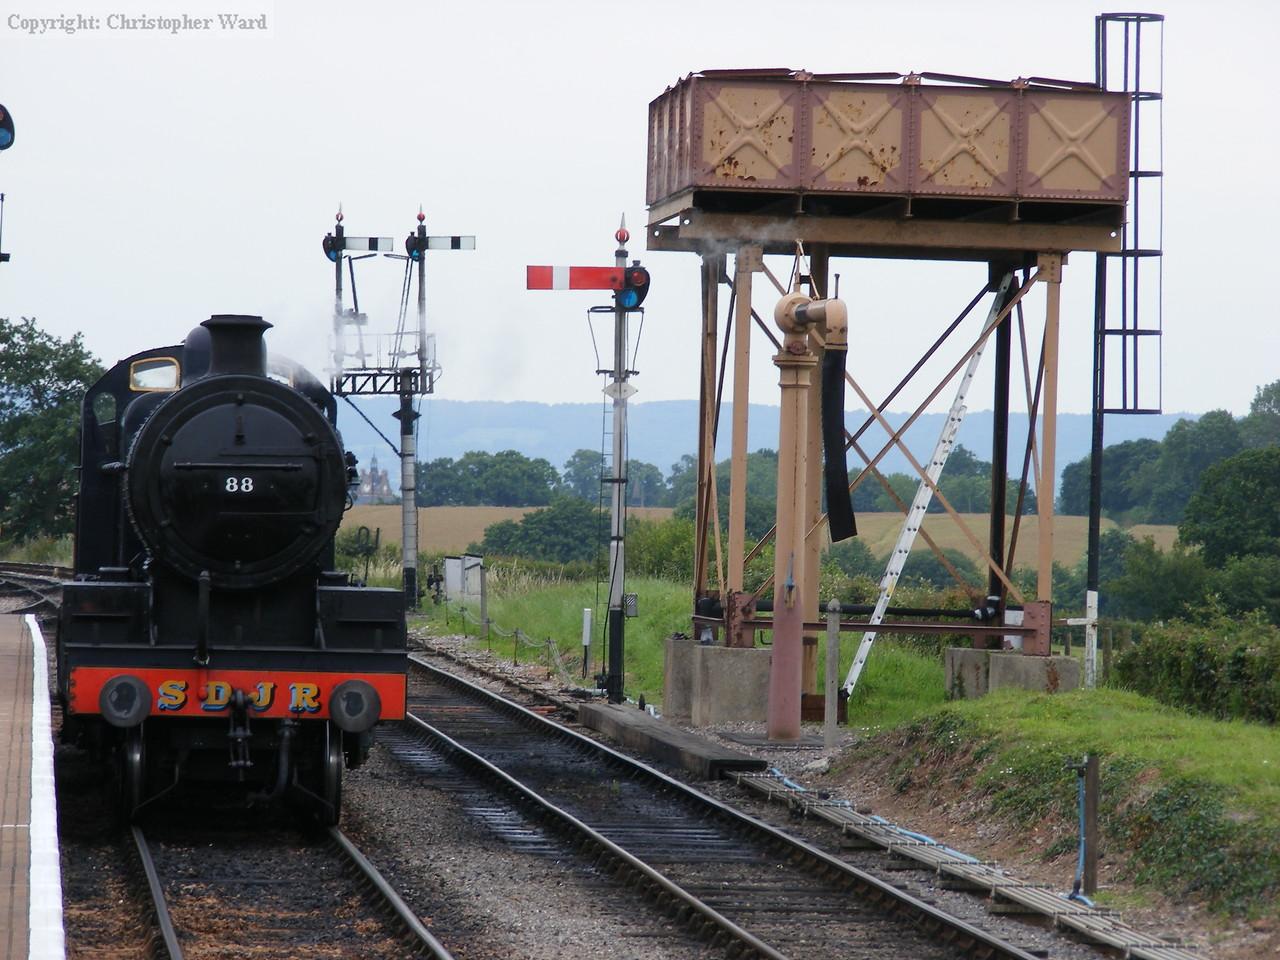 No.88 runs round the train